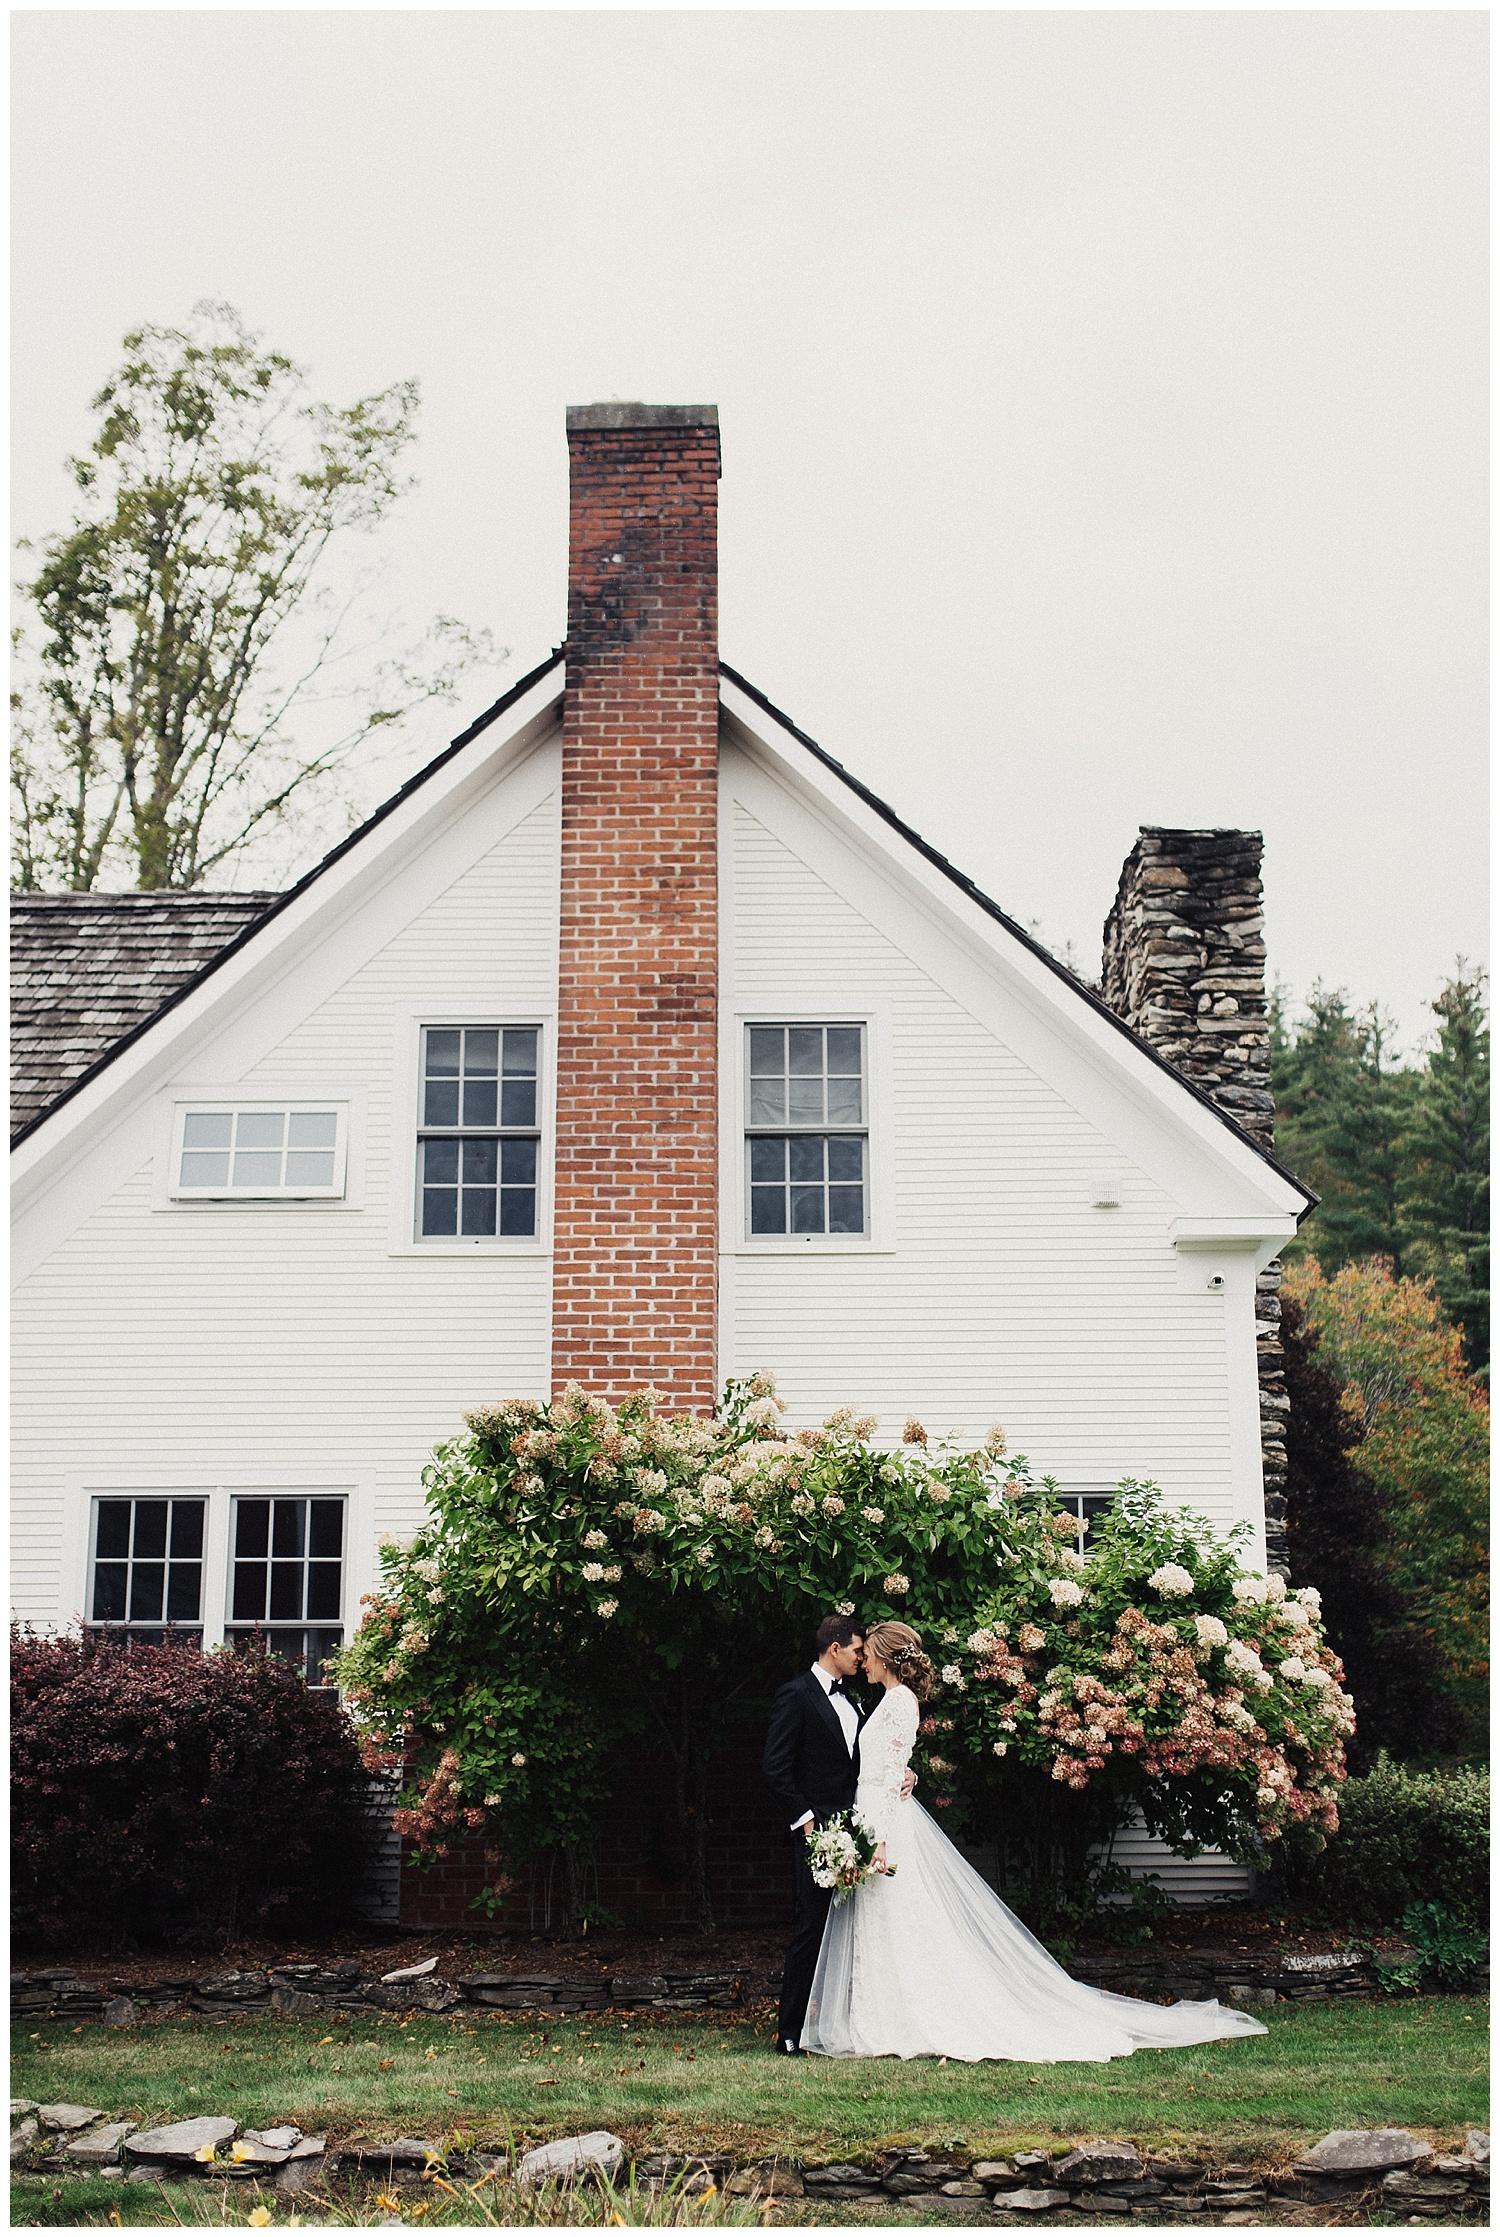 Eden Strader Fall Wedding at Riverside Farms Pittsfield Vermont